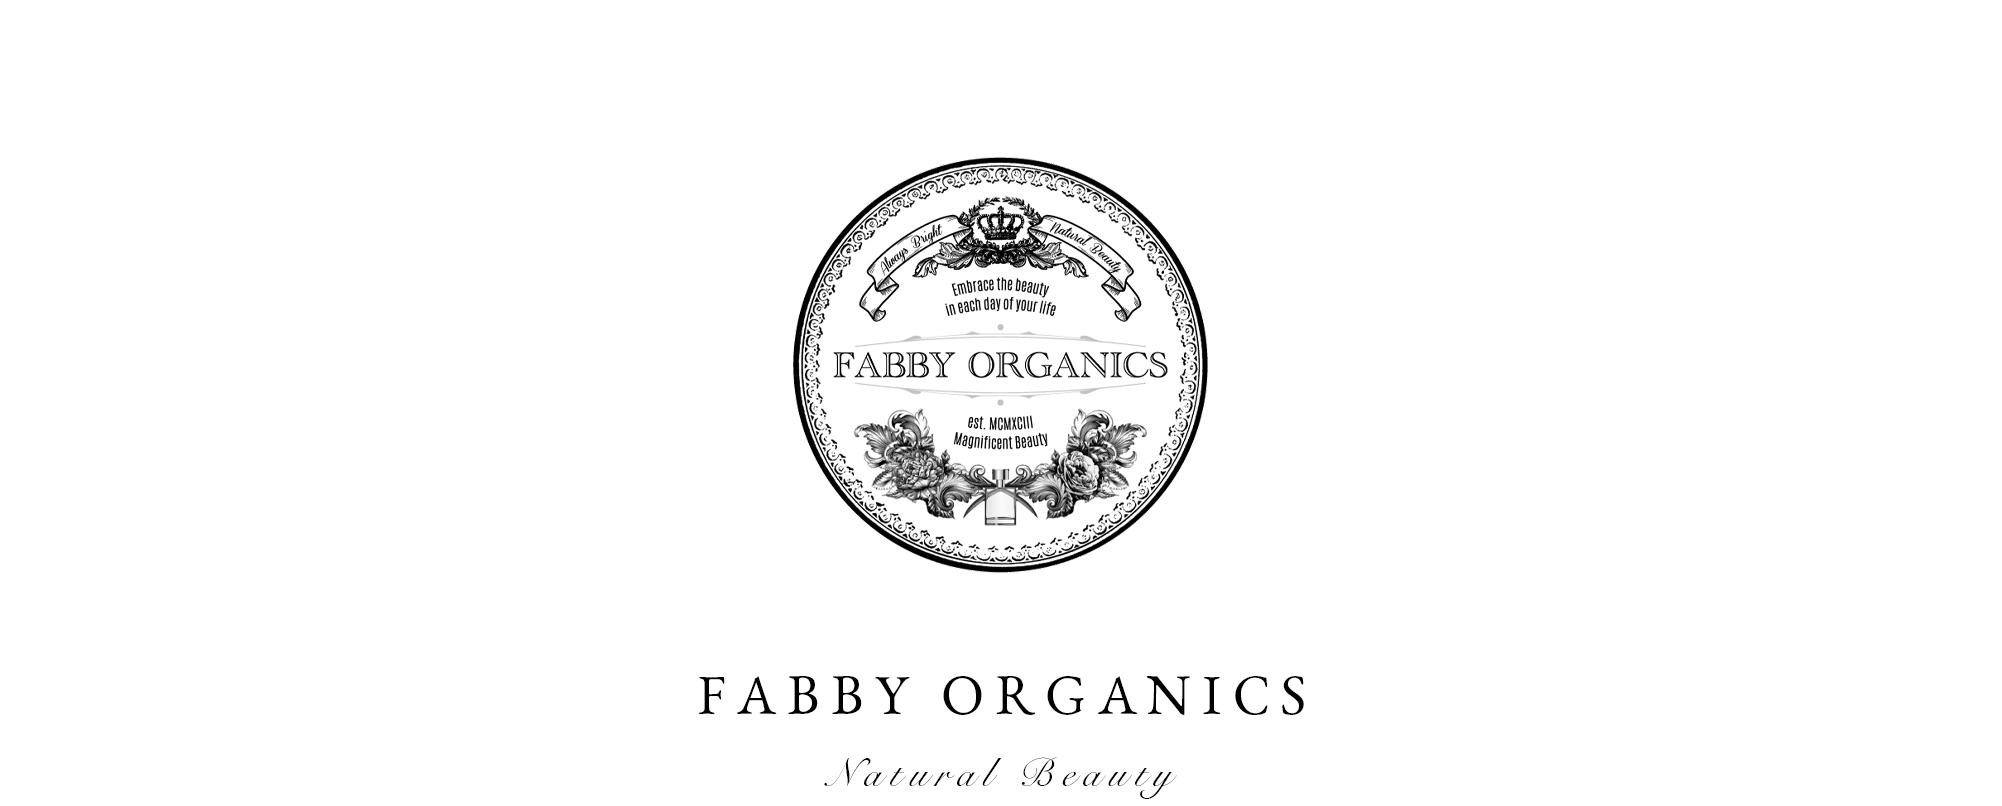 FABBY ORGANICS Web Shop